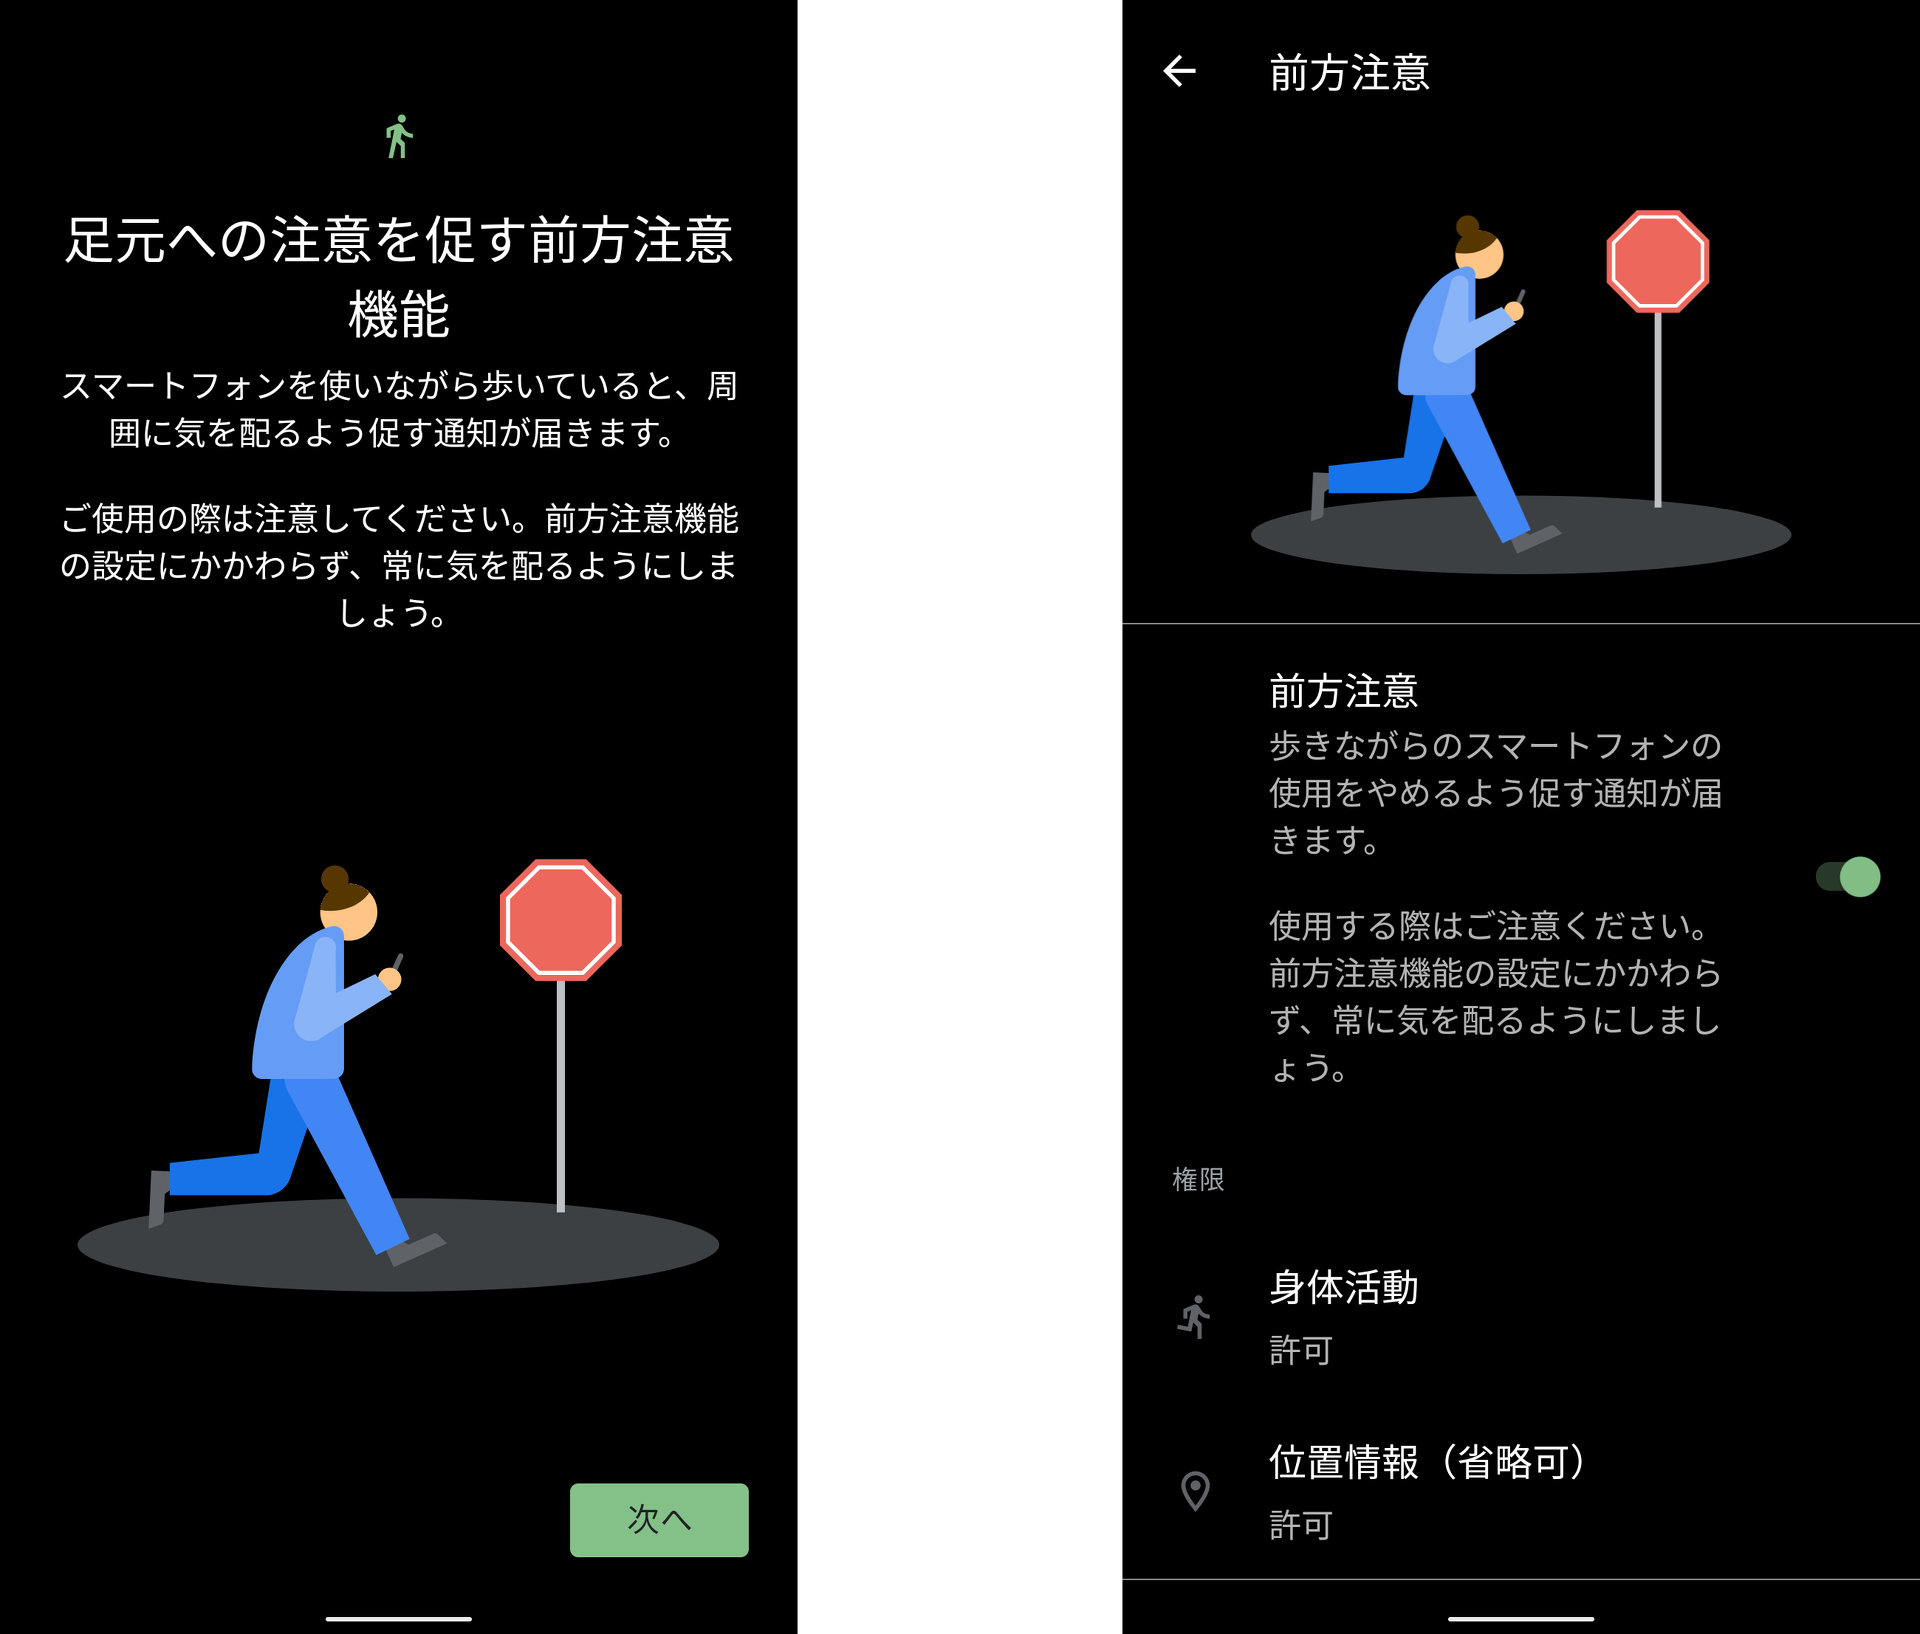 Pixelシリーズに歩きスマホしていると注意する新機能「前方注意 ...